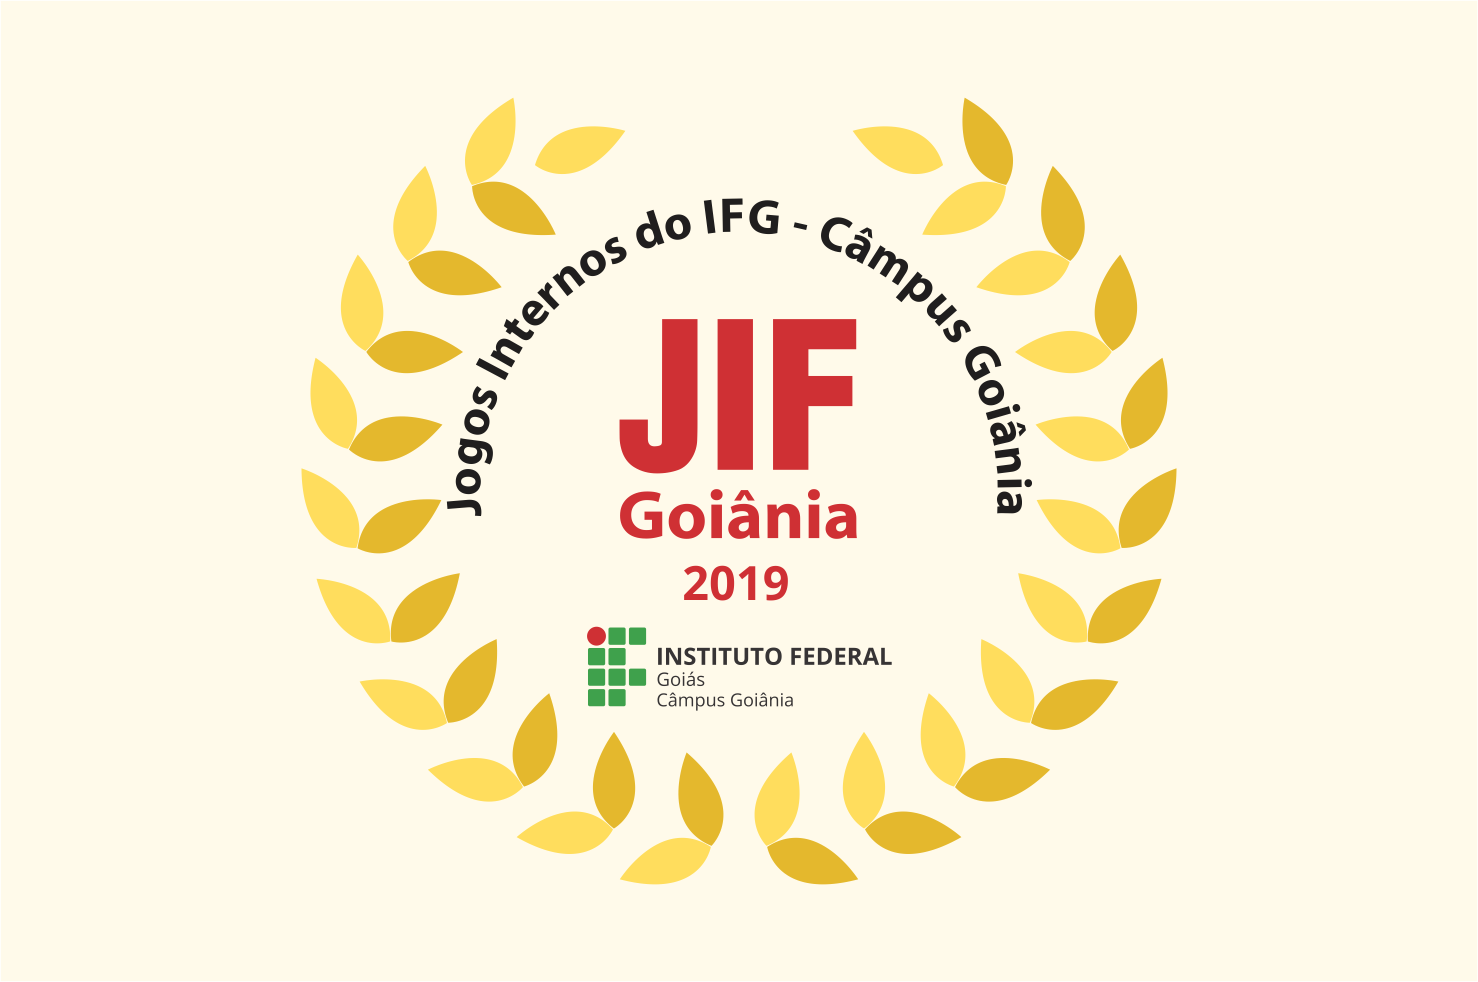 JIF Goiânia 2019